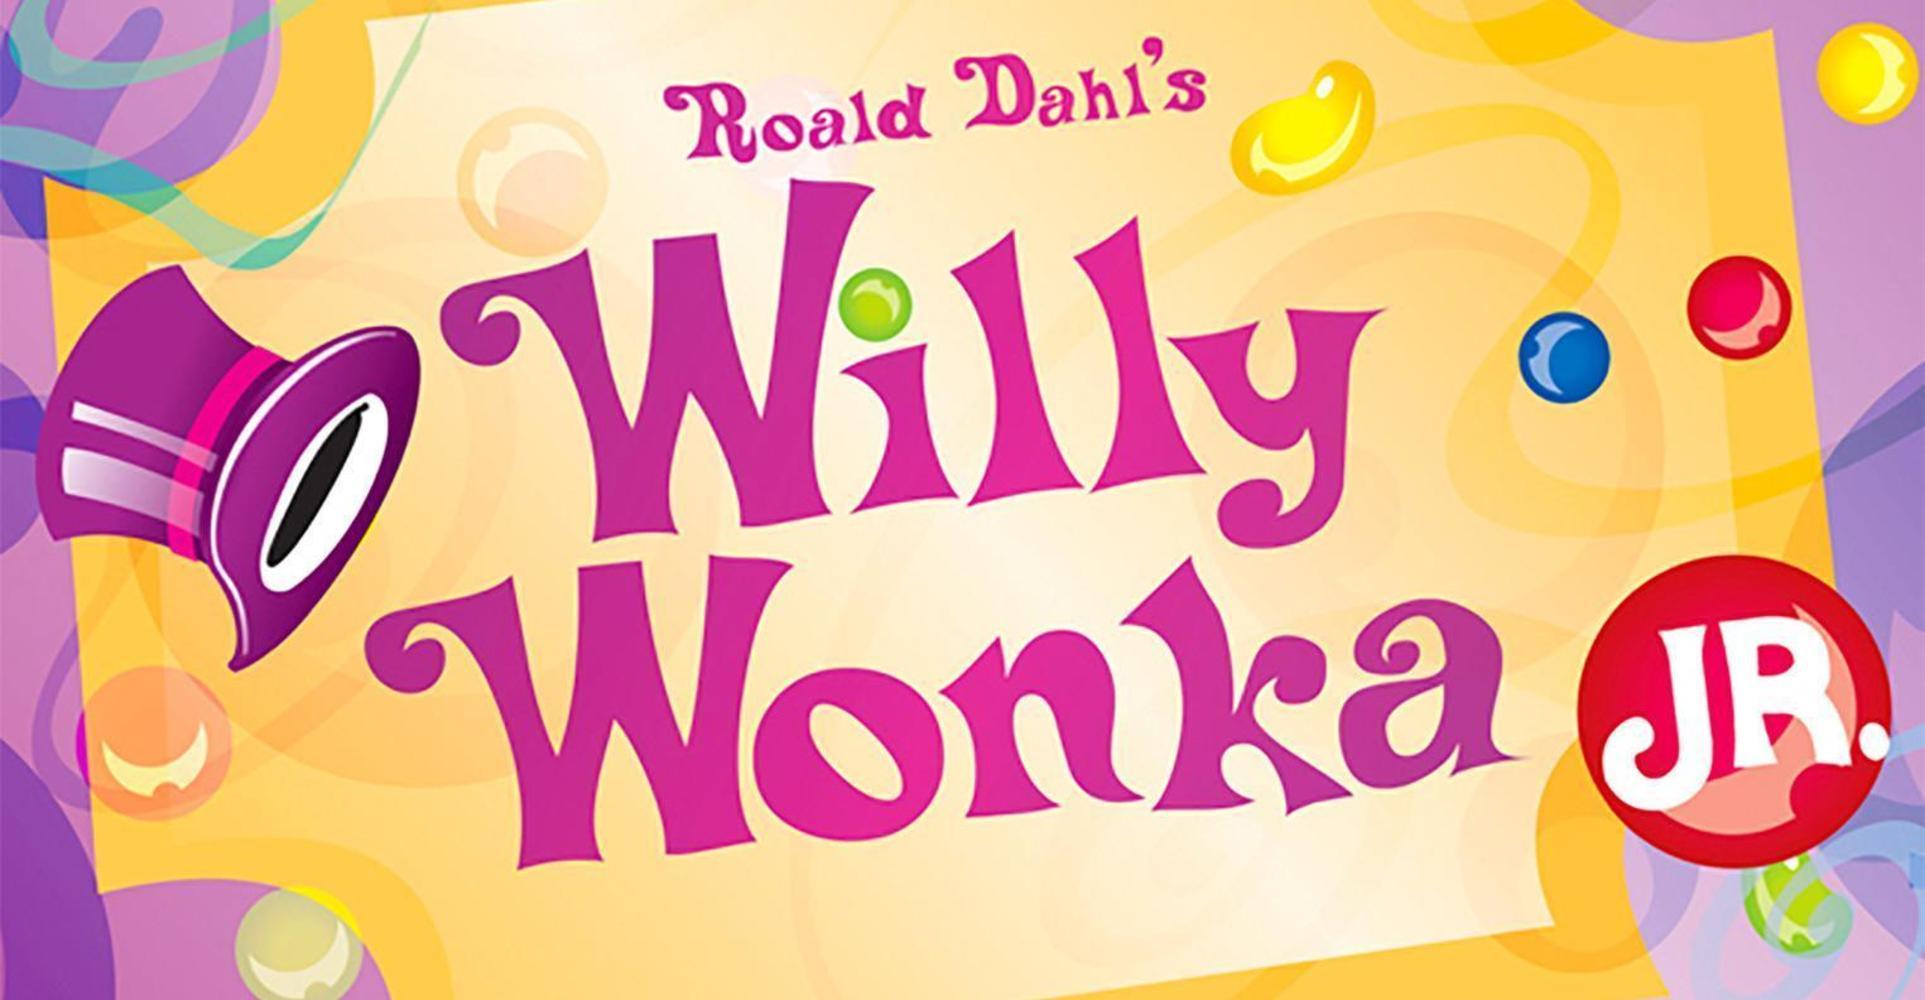 Roald Dahl's Willy Wonka Jr.